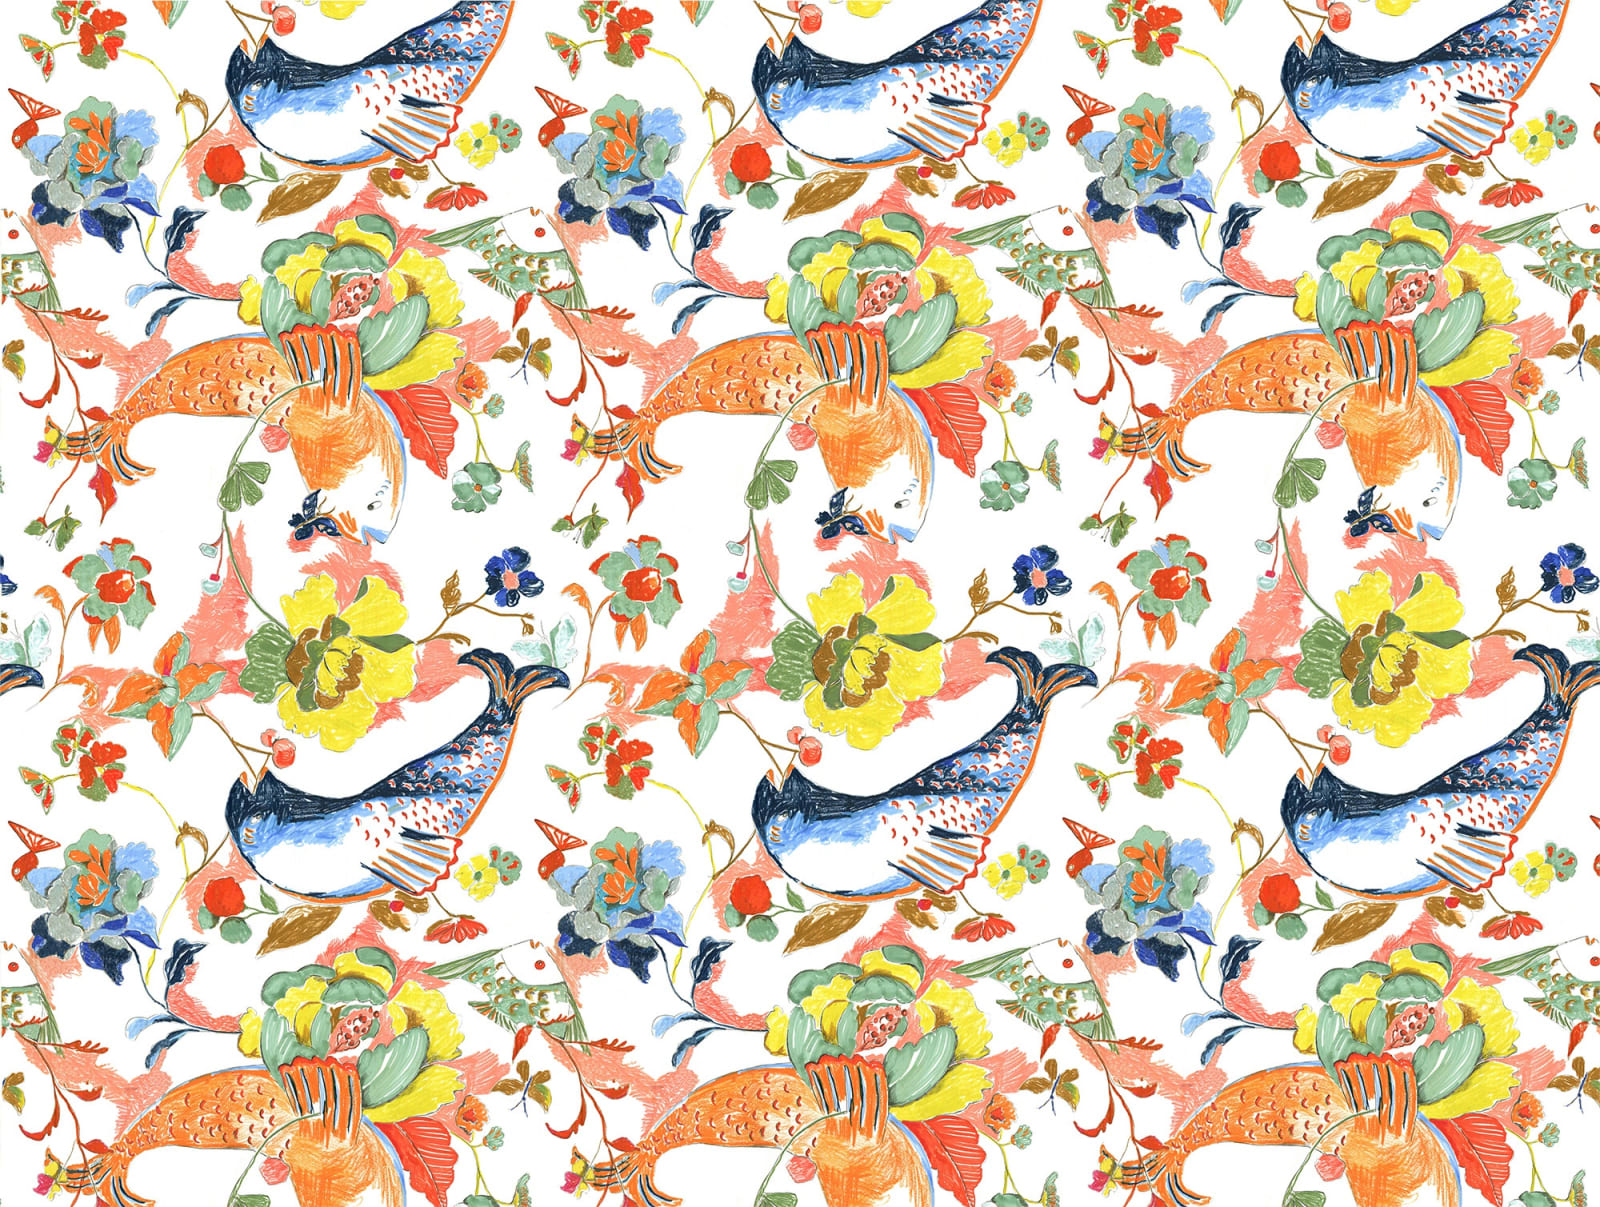 Ravenna Osgood, Betty-O Fish & Floral Wallpaper, 2018